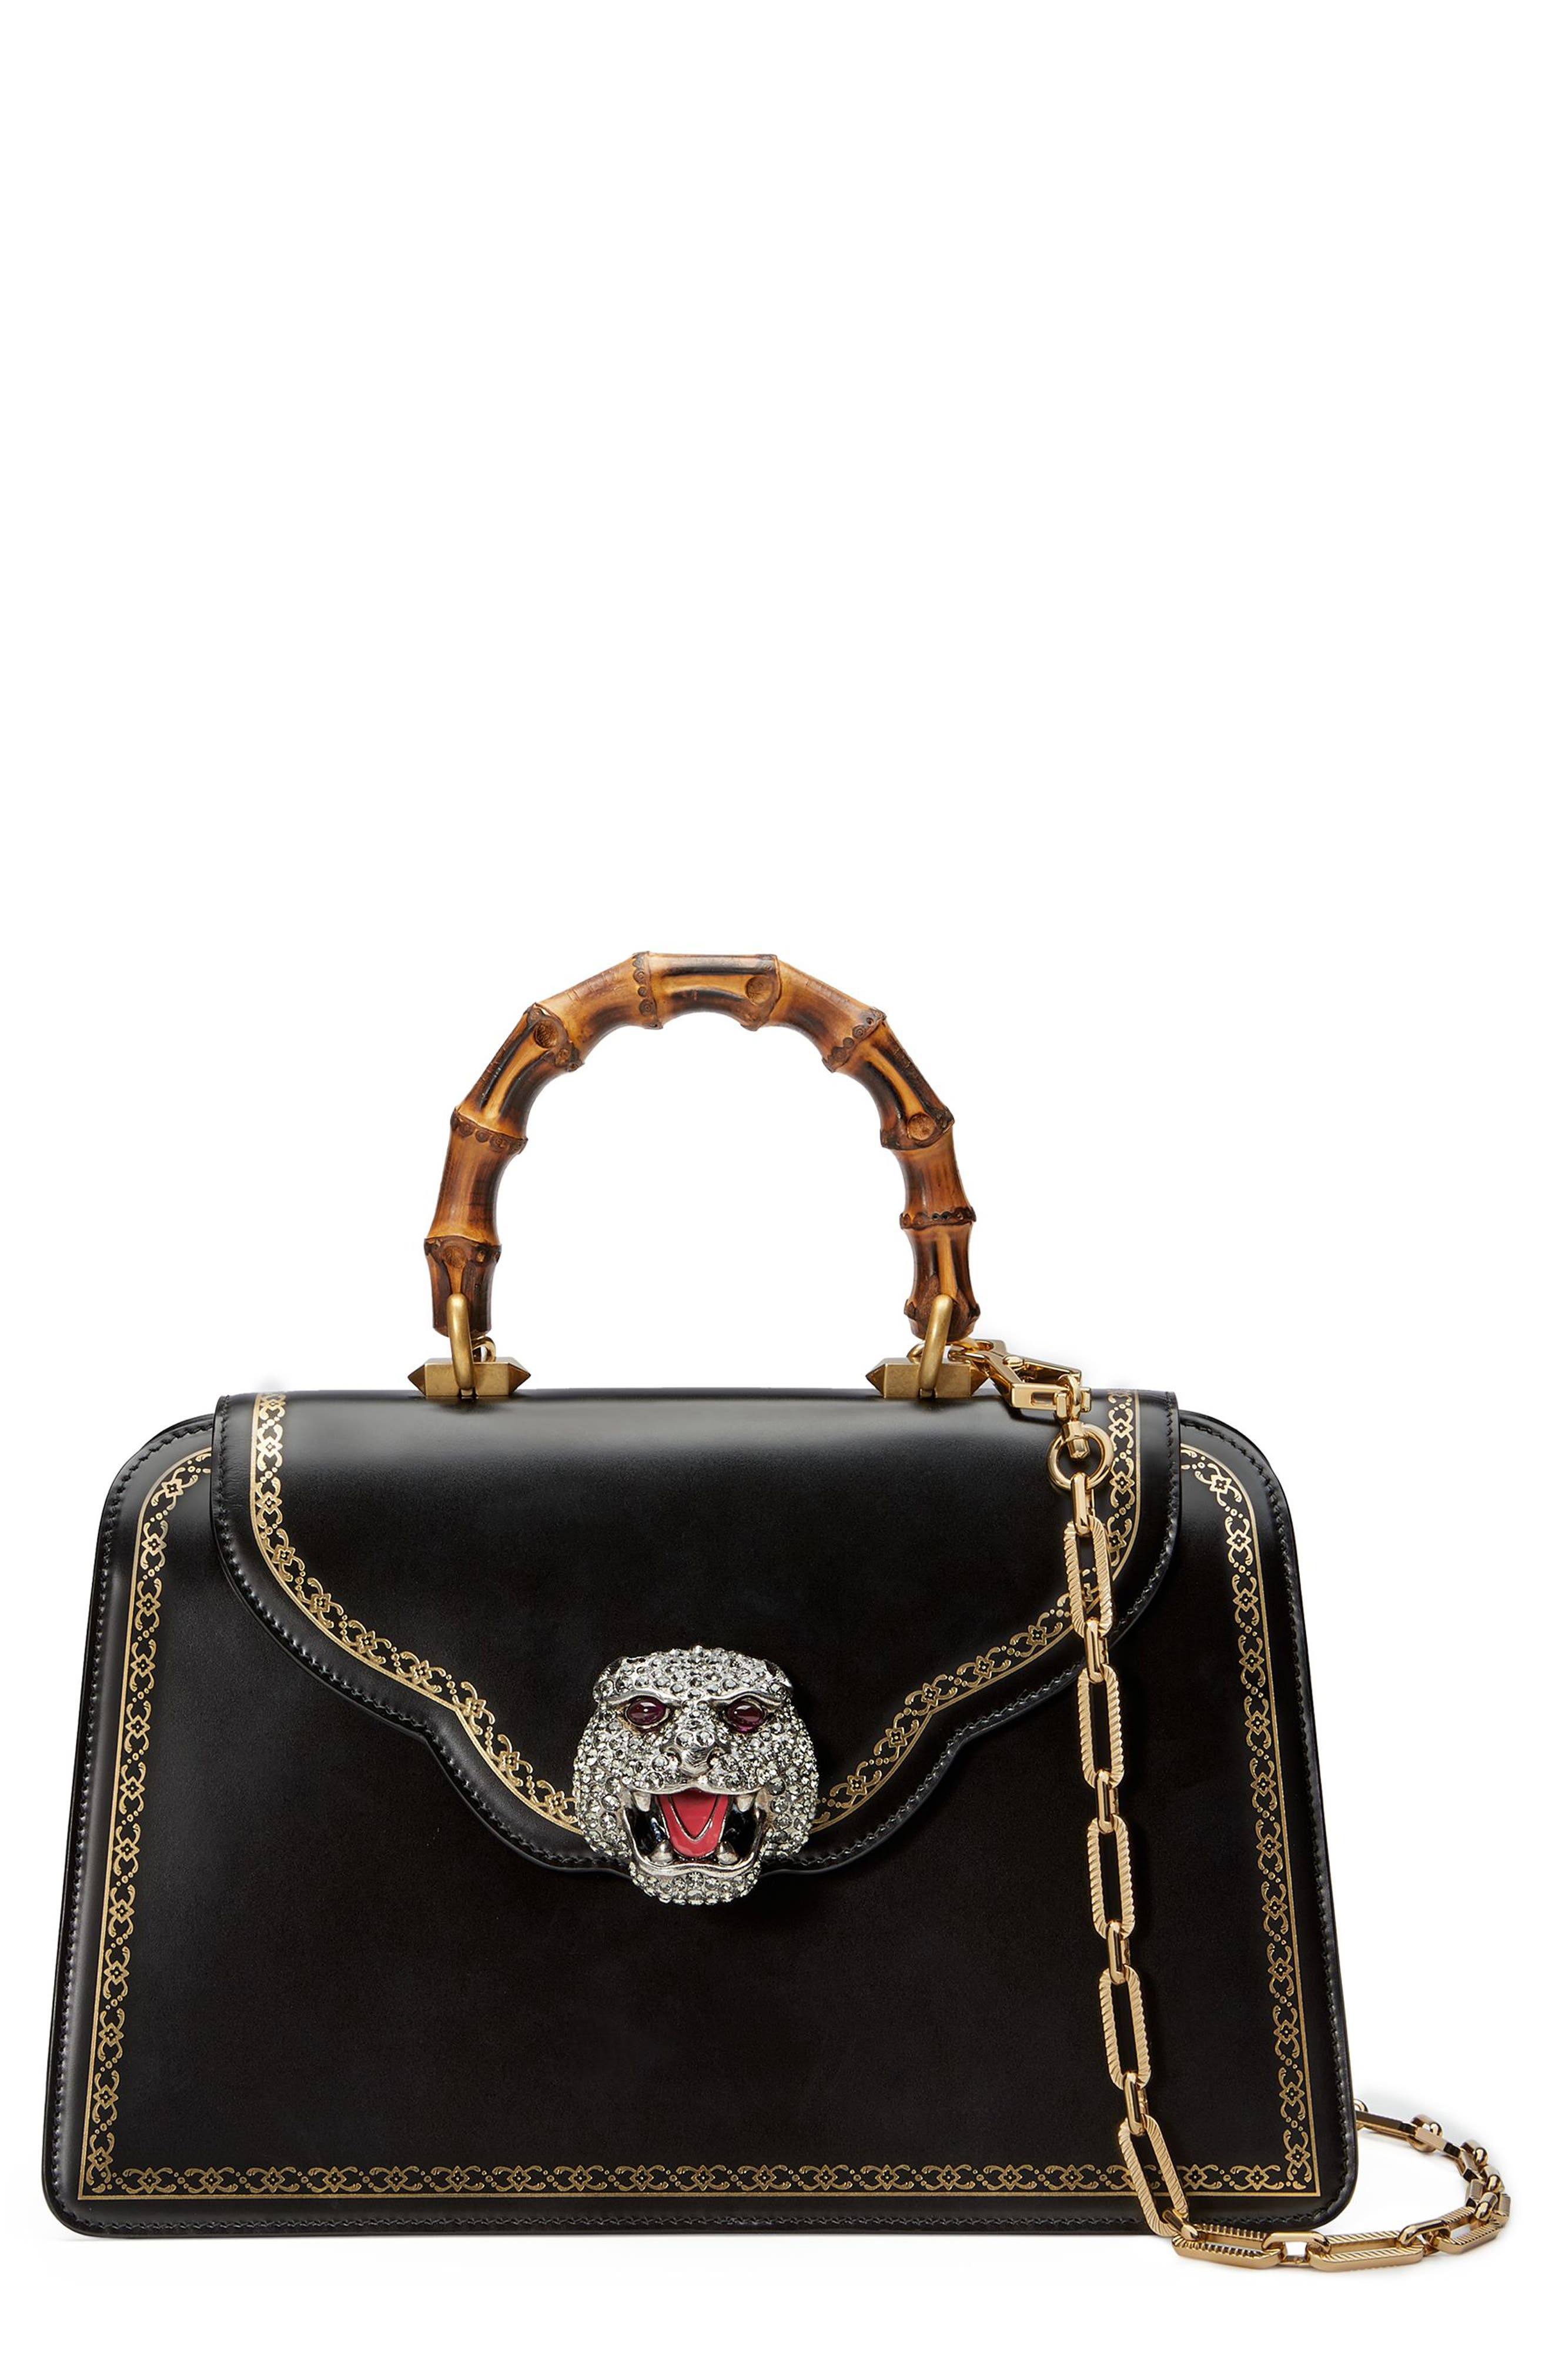 Main Image - Gucci Gatto Medium Top Handle Bag